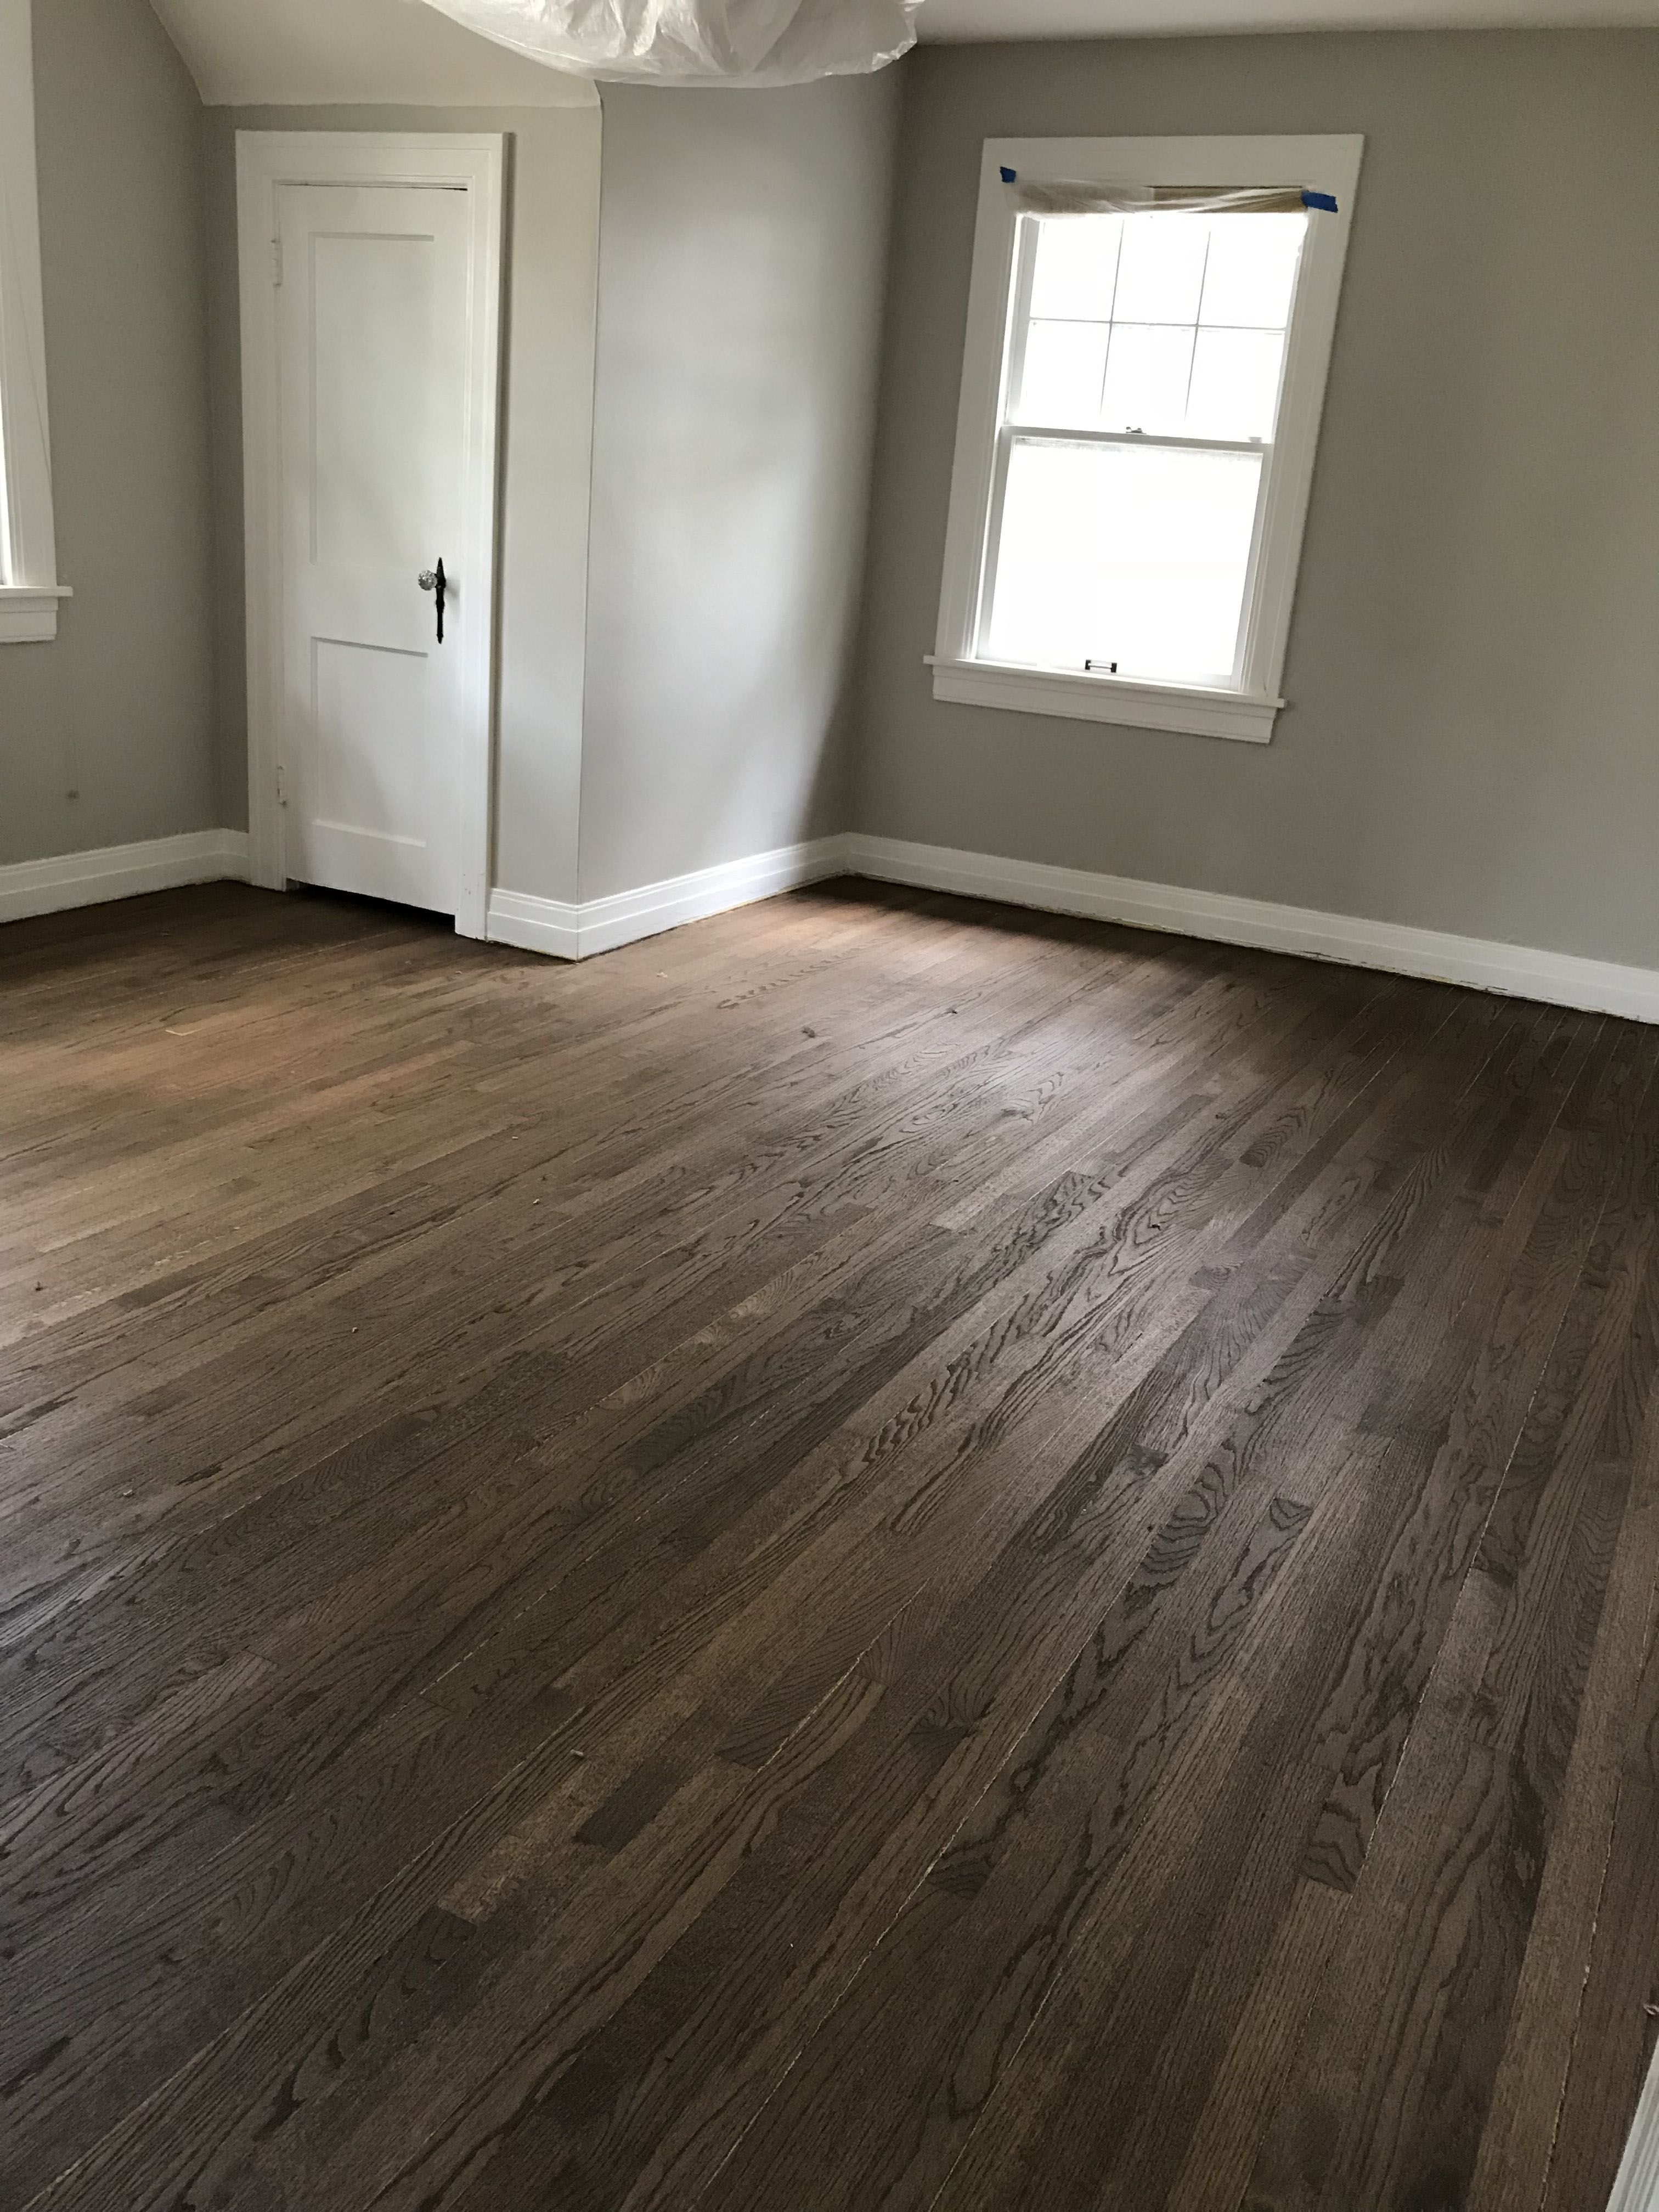 Vinyl Wooden Flooring Dubai In 2020 Flooring Cost Hardwood